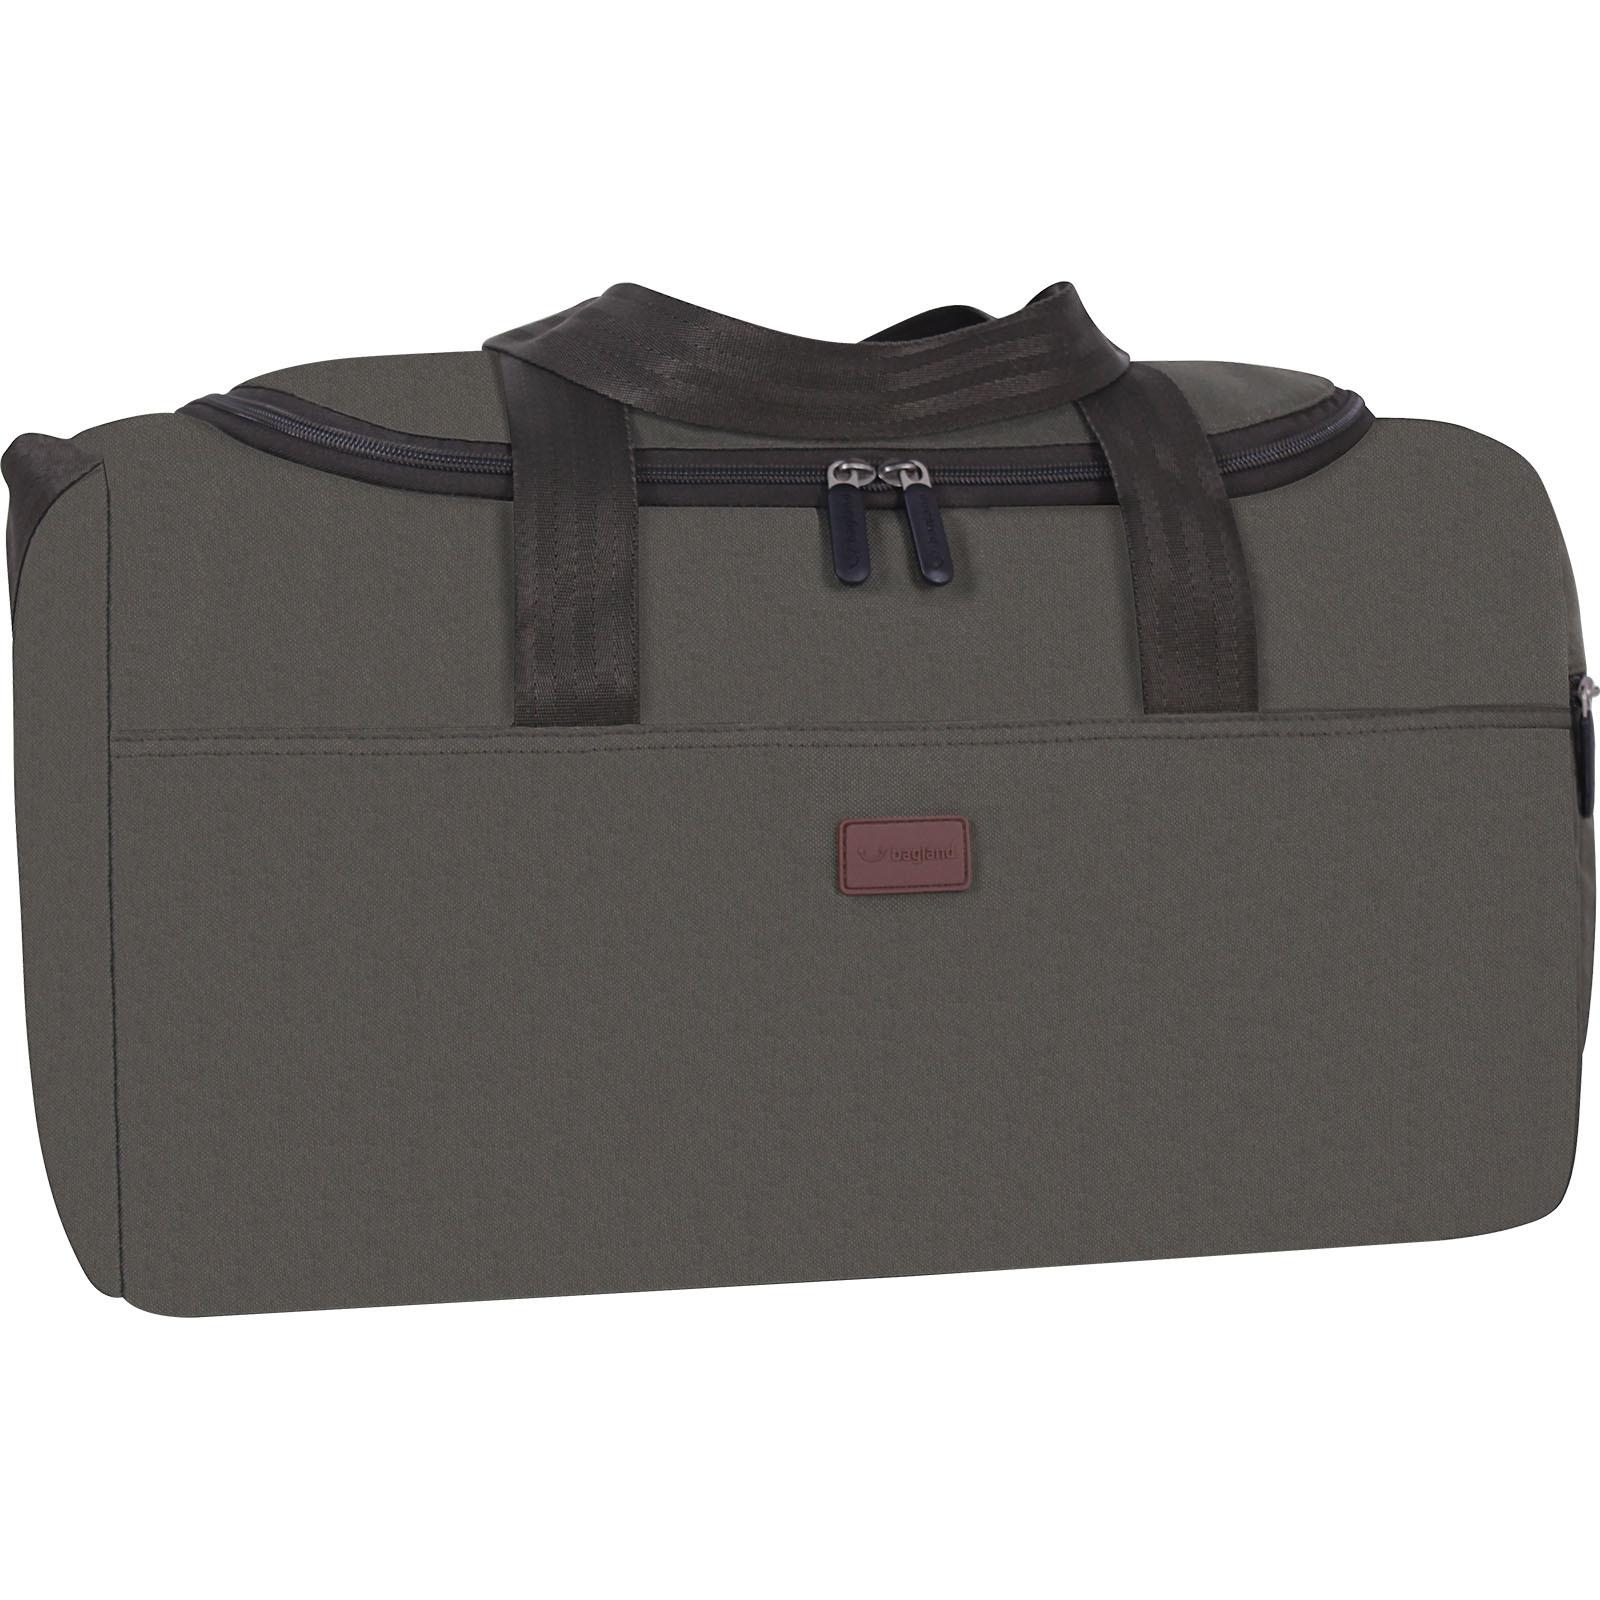 Дорожные сумки Сумка Bagland Boston 25 л. Хаки (0037466) IMG_7134-1600.jpg